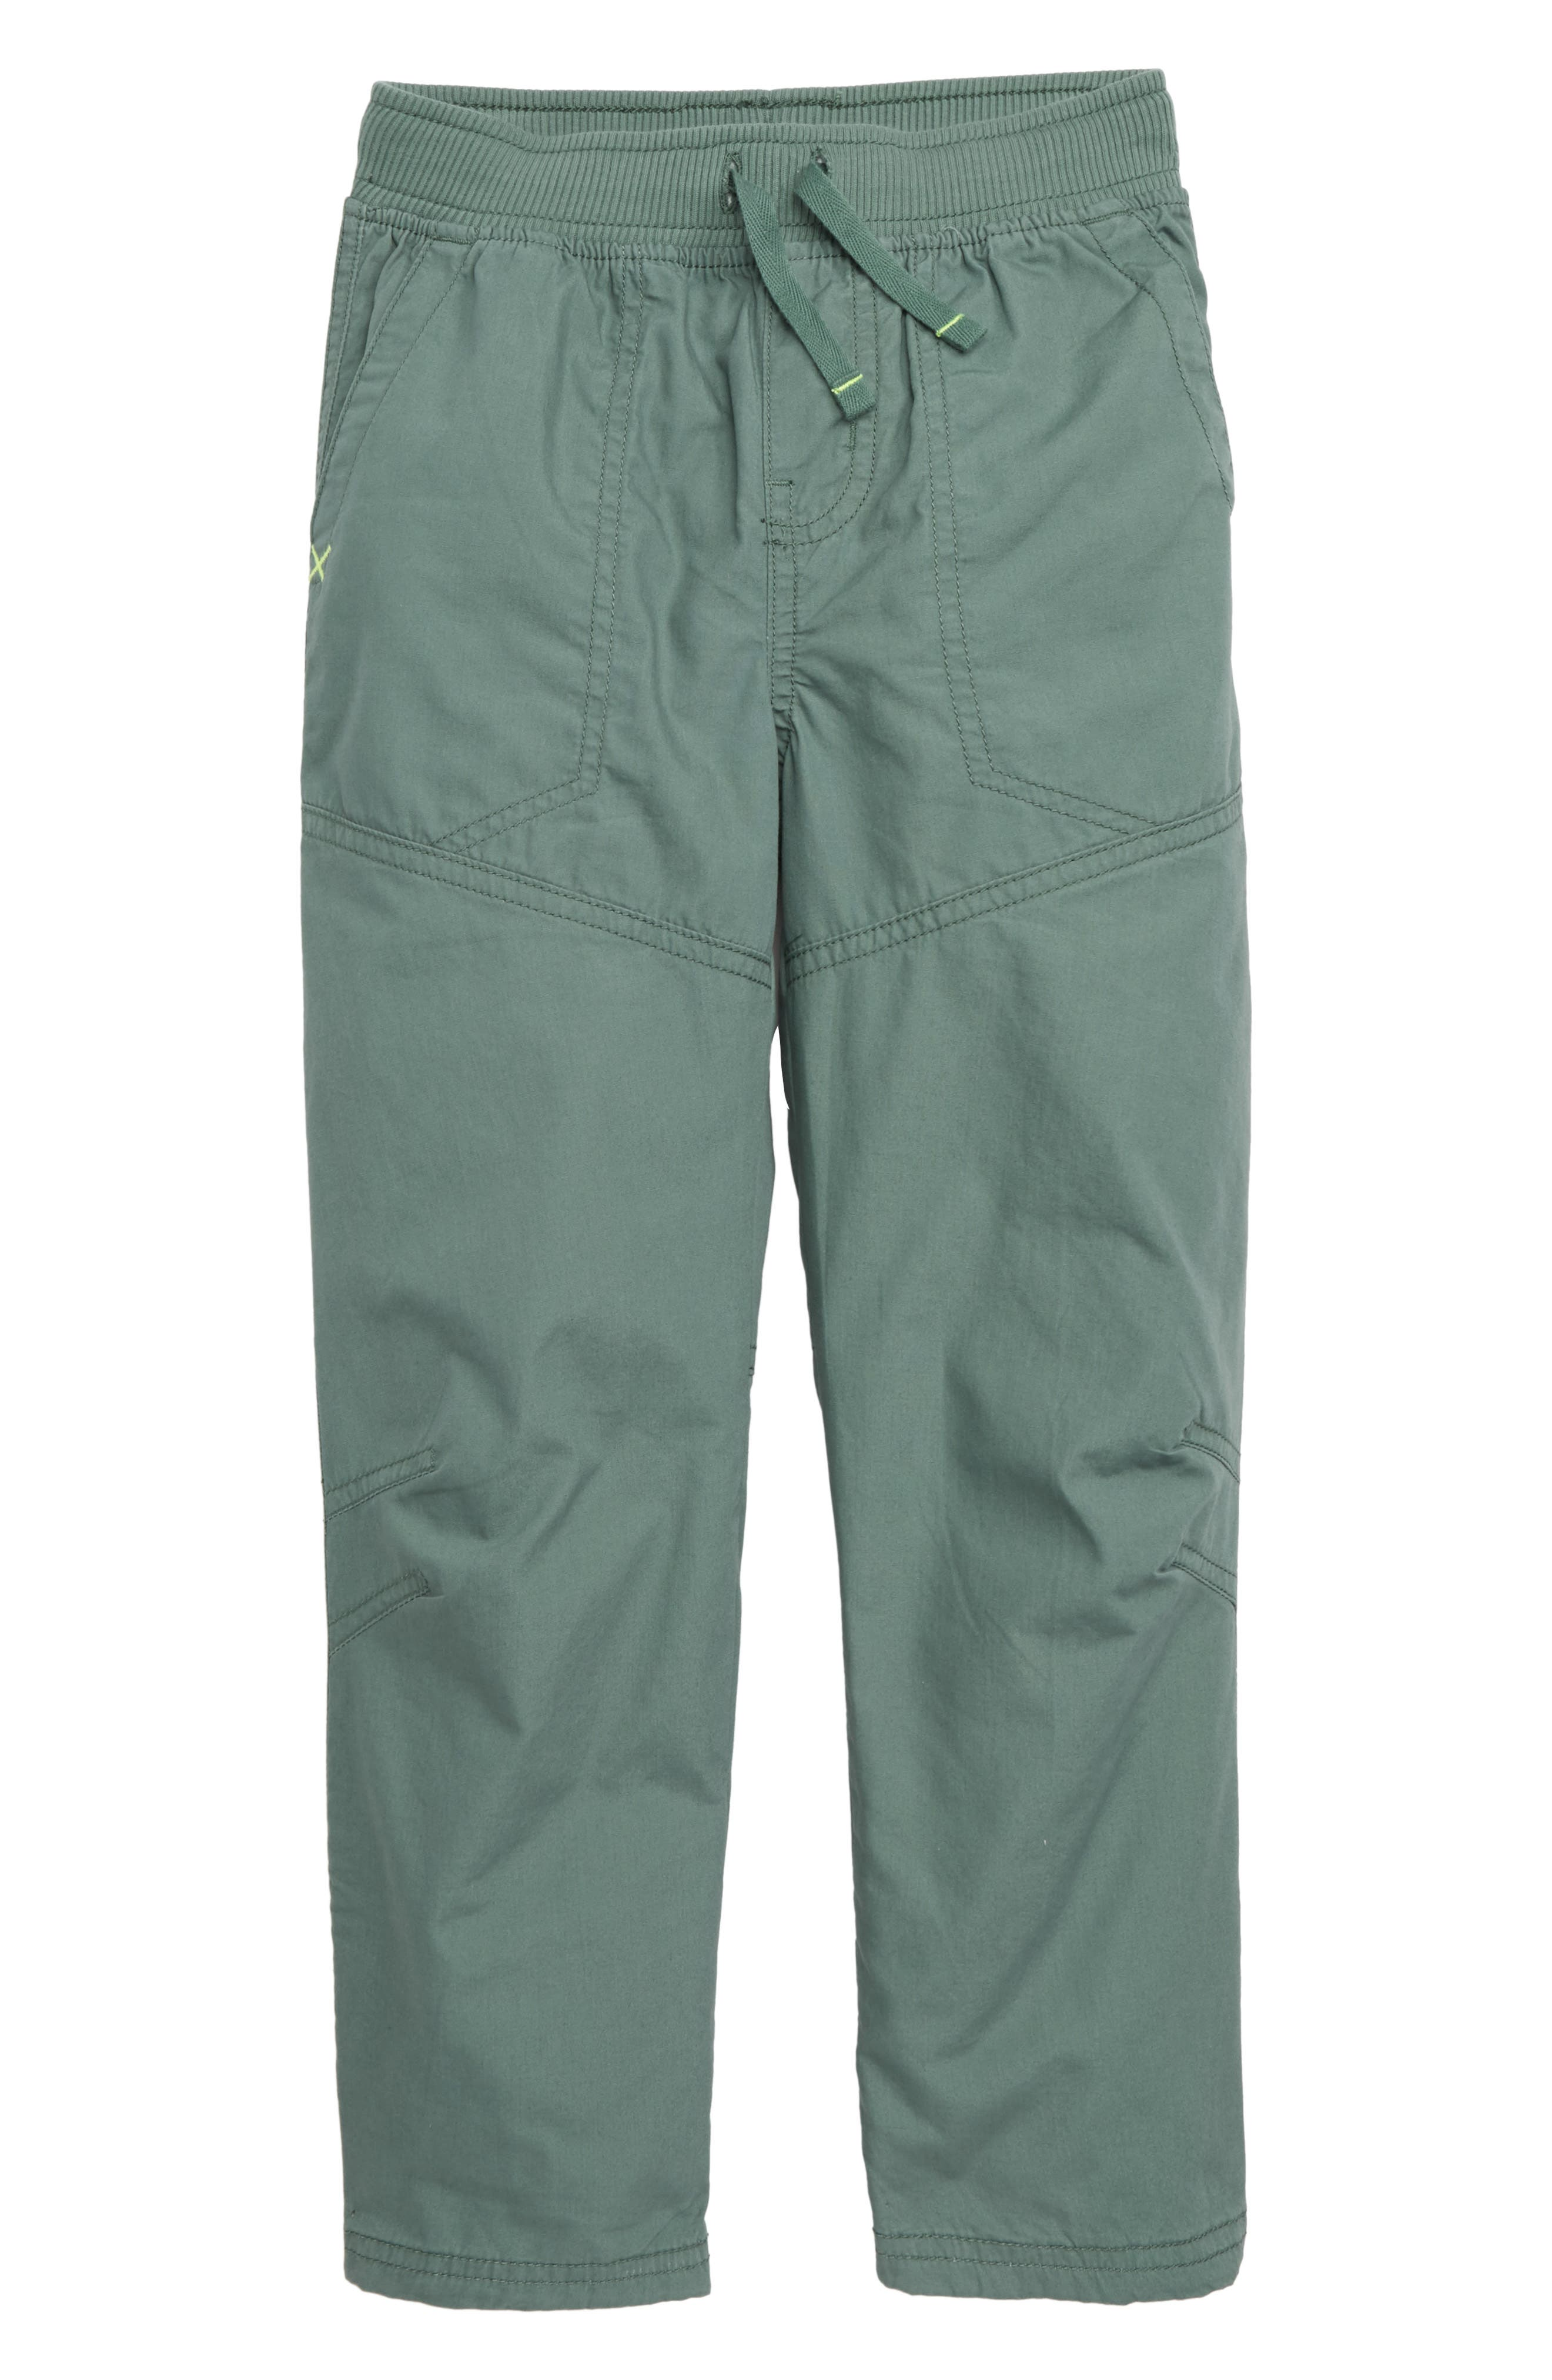 Lined Pants,                             Main thumbnail 1, color,                             FOLIAGE